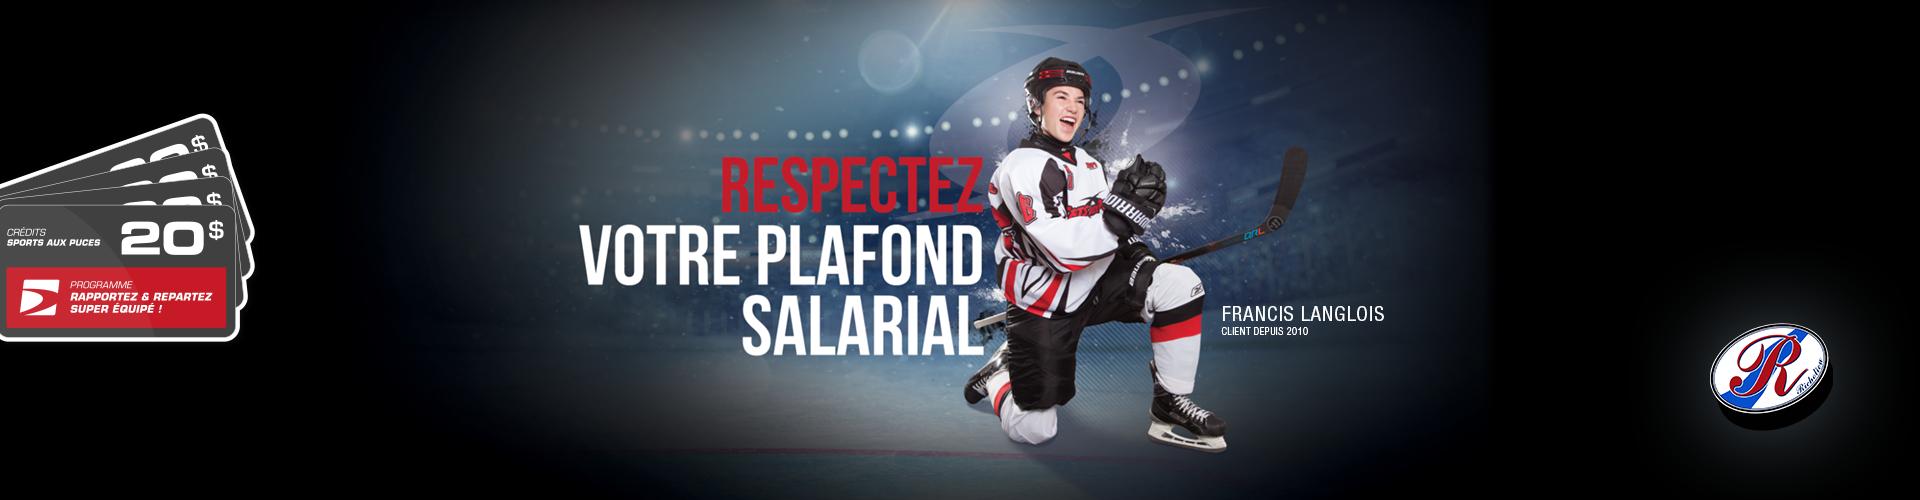 SAP_Caroussel_hockey-2016-1